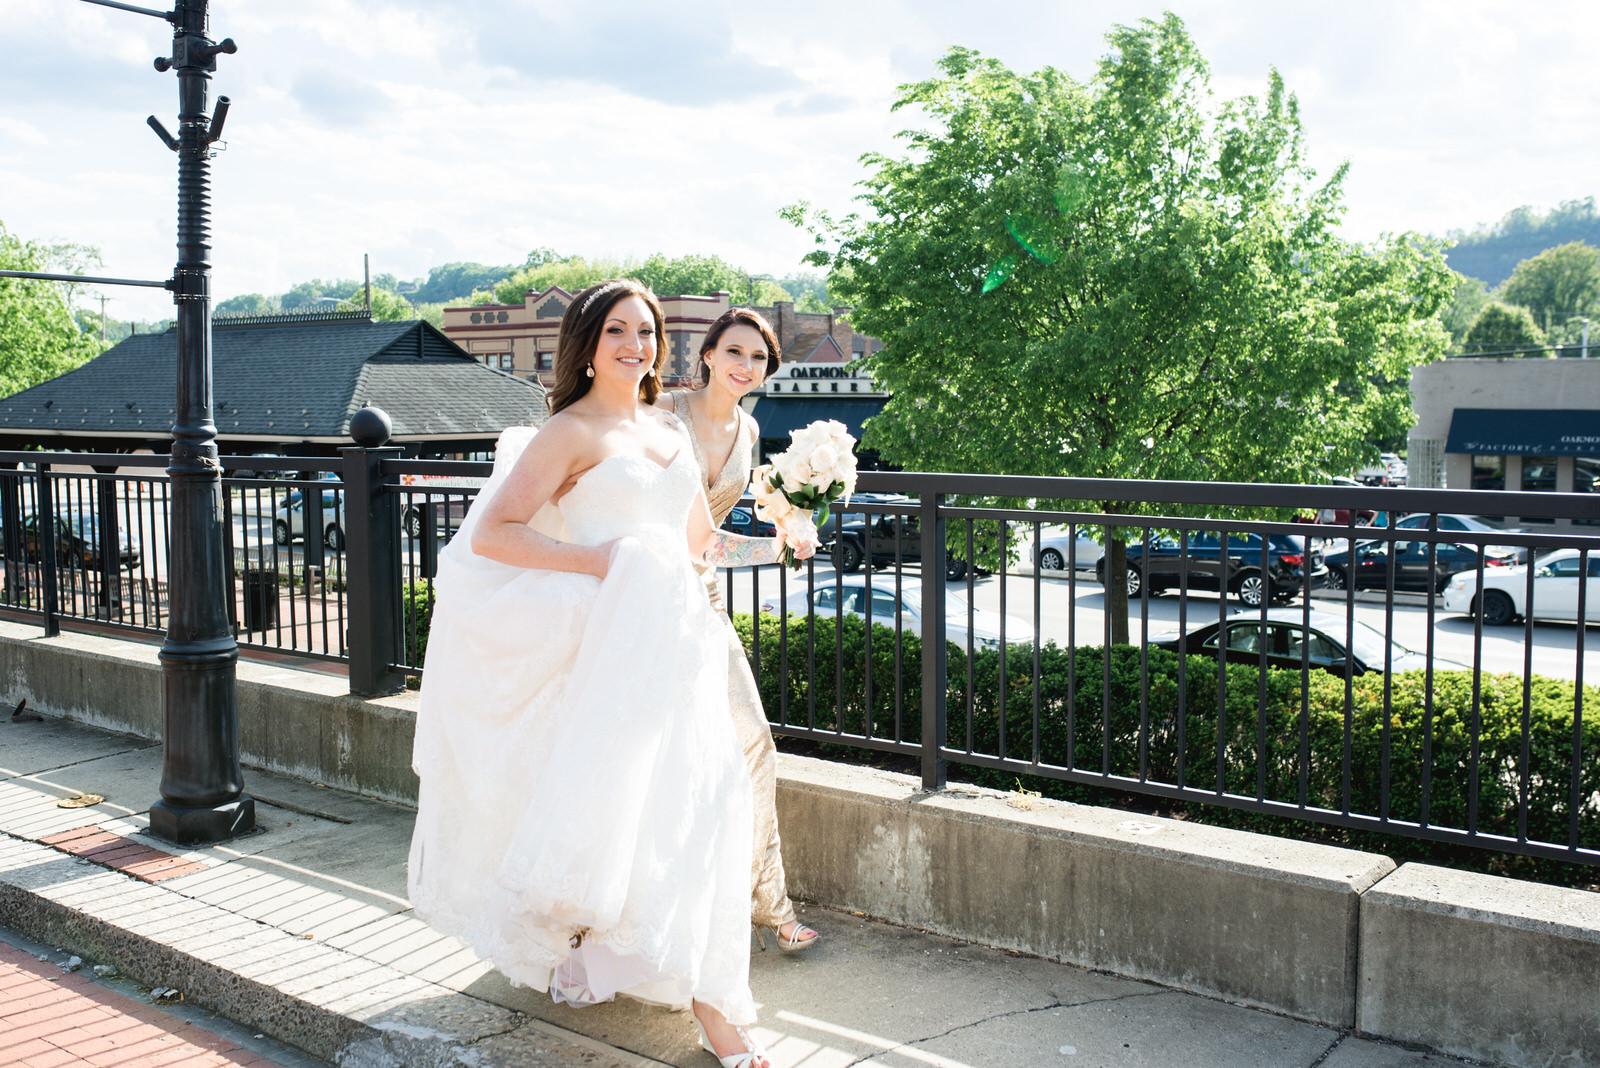 Laube_Banquet_Hall__Wedding_Photos_017.jpg